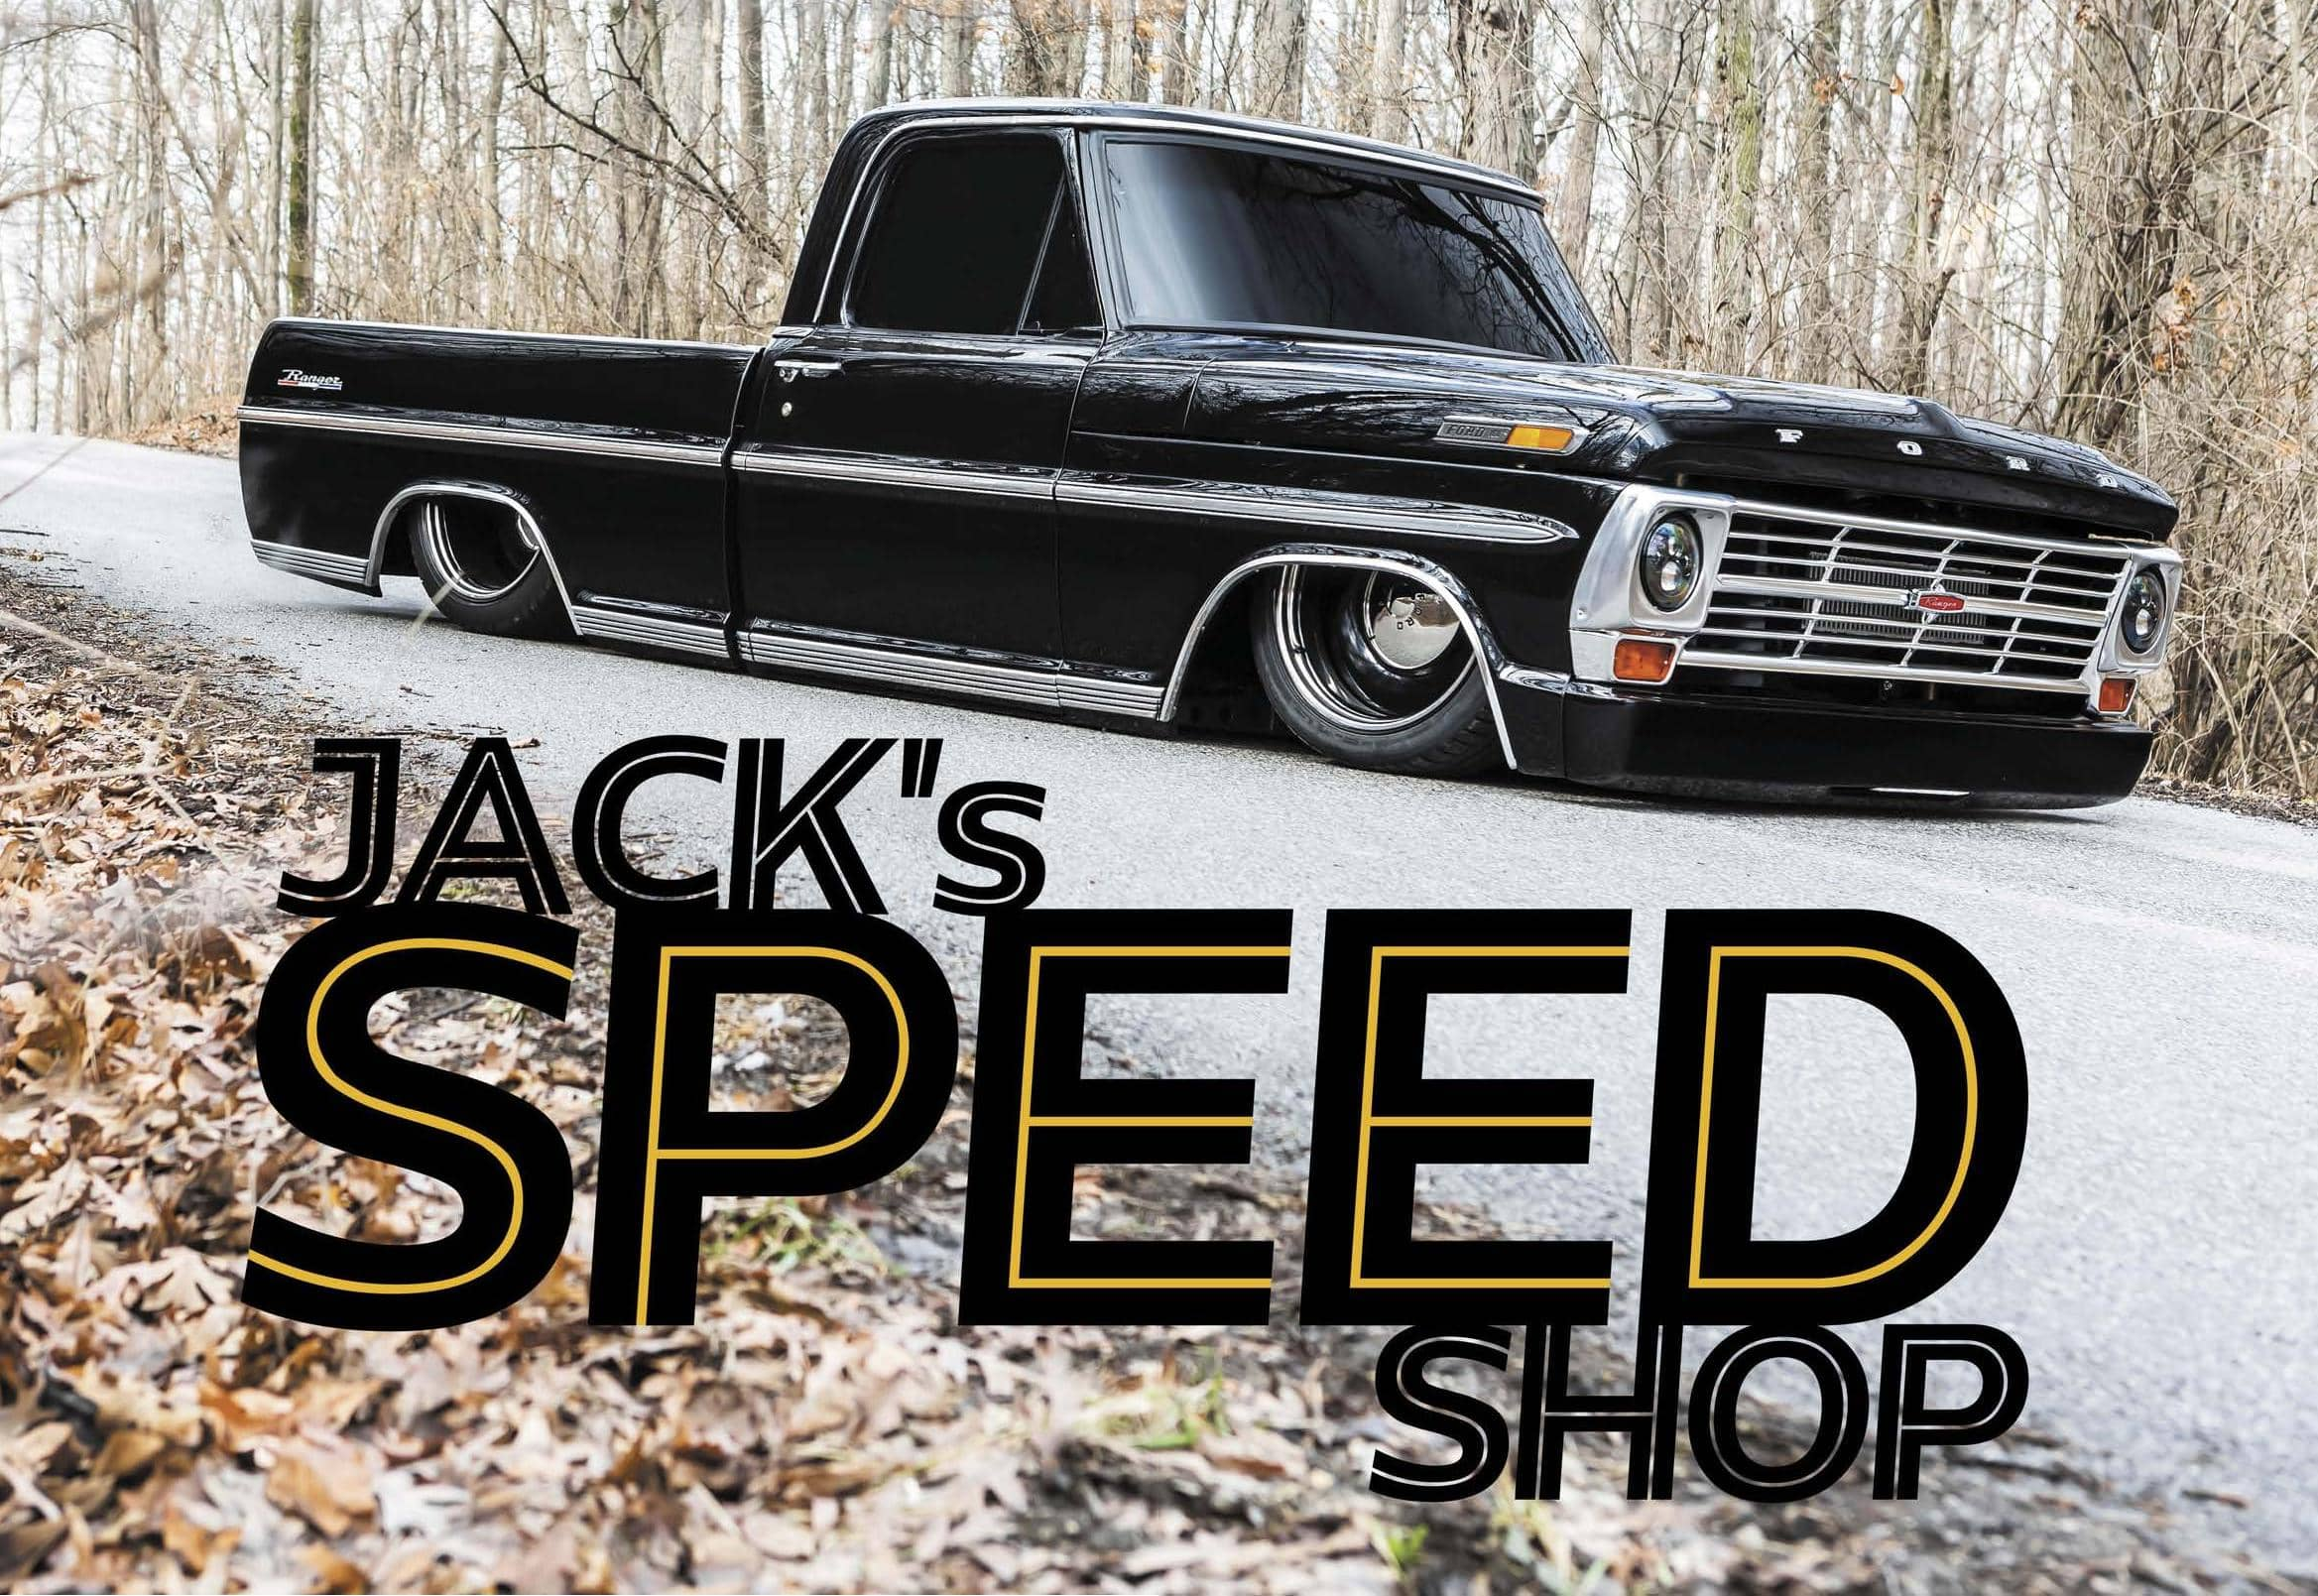 JACK'S SPEED SHOP